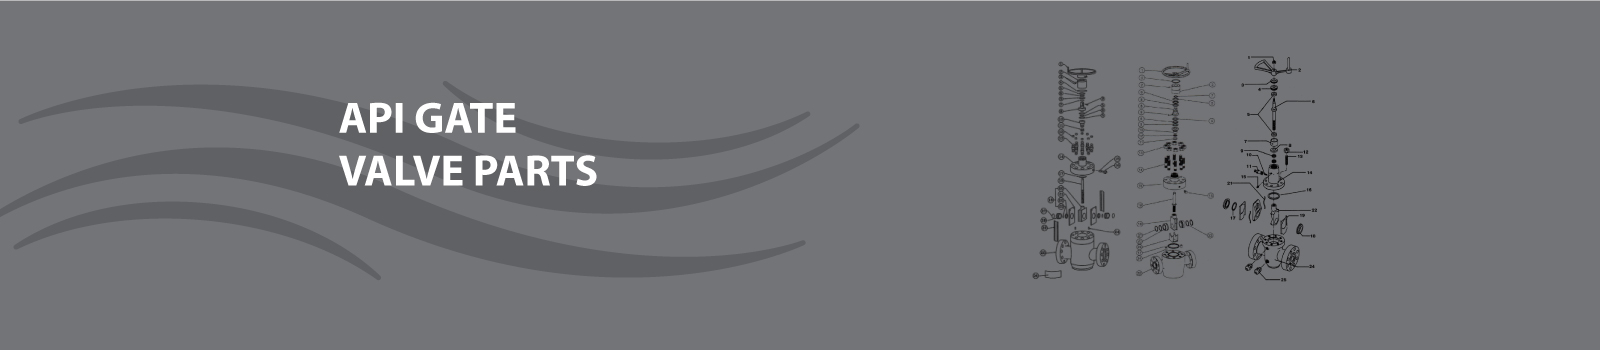 API Gate Valve Part Header